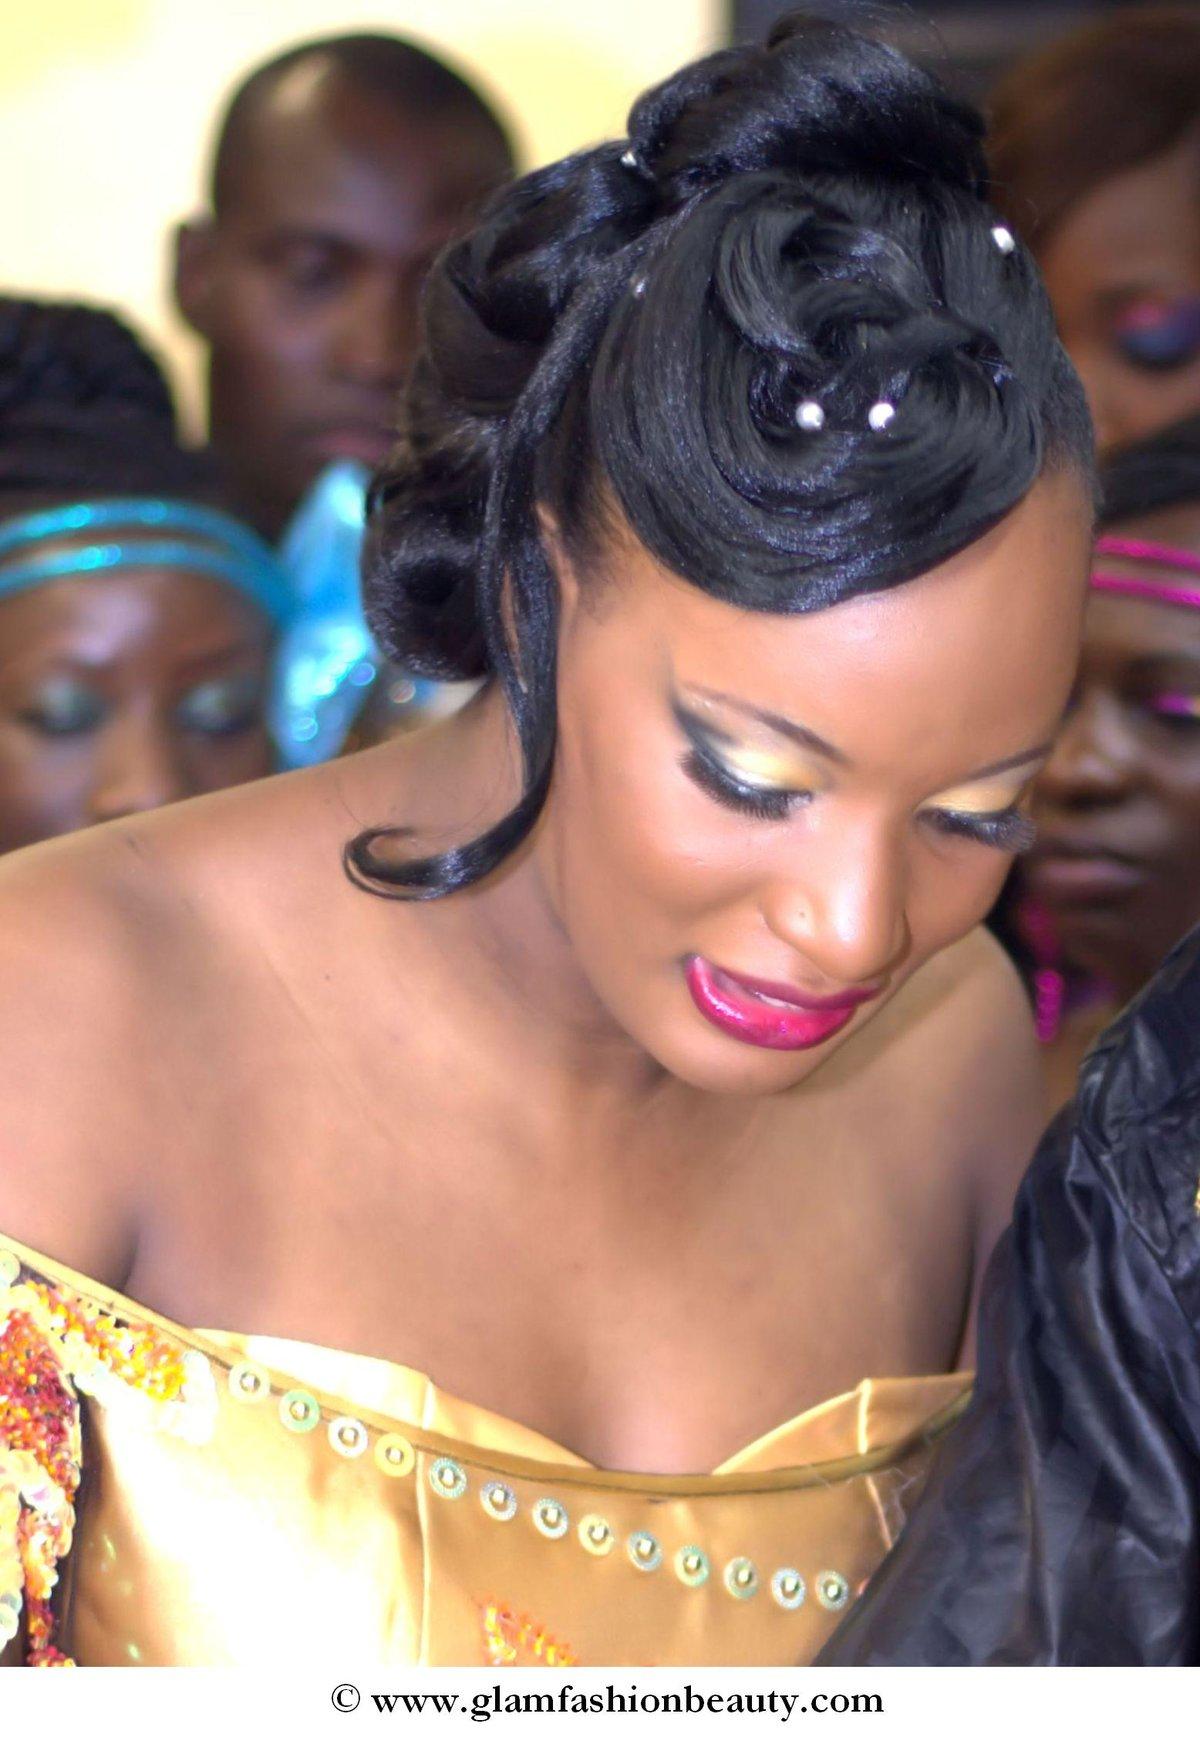 Chignon Glamour Inspiration Retro Idees Coiffure Afro Tresses Vanille Tissage Locks Braids Lissage Extensions